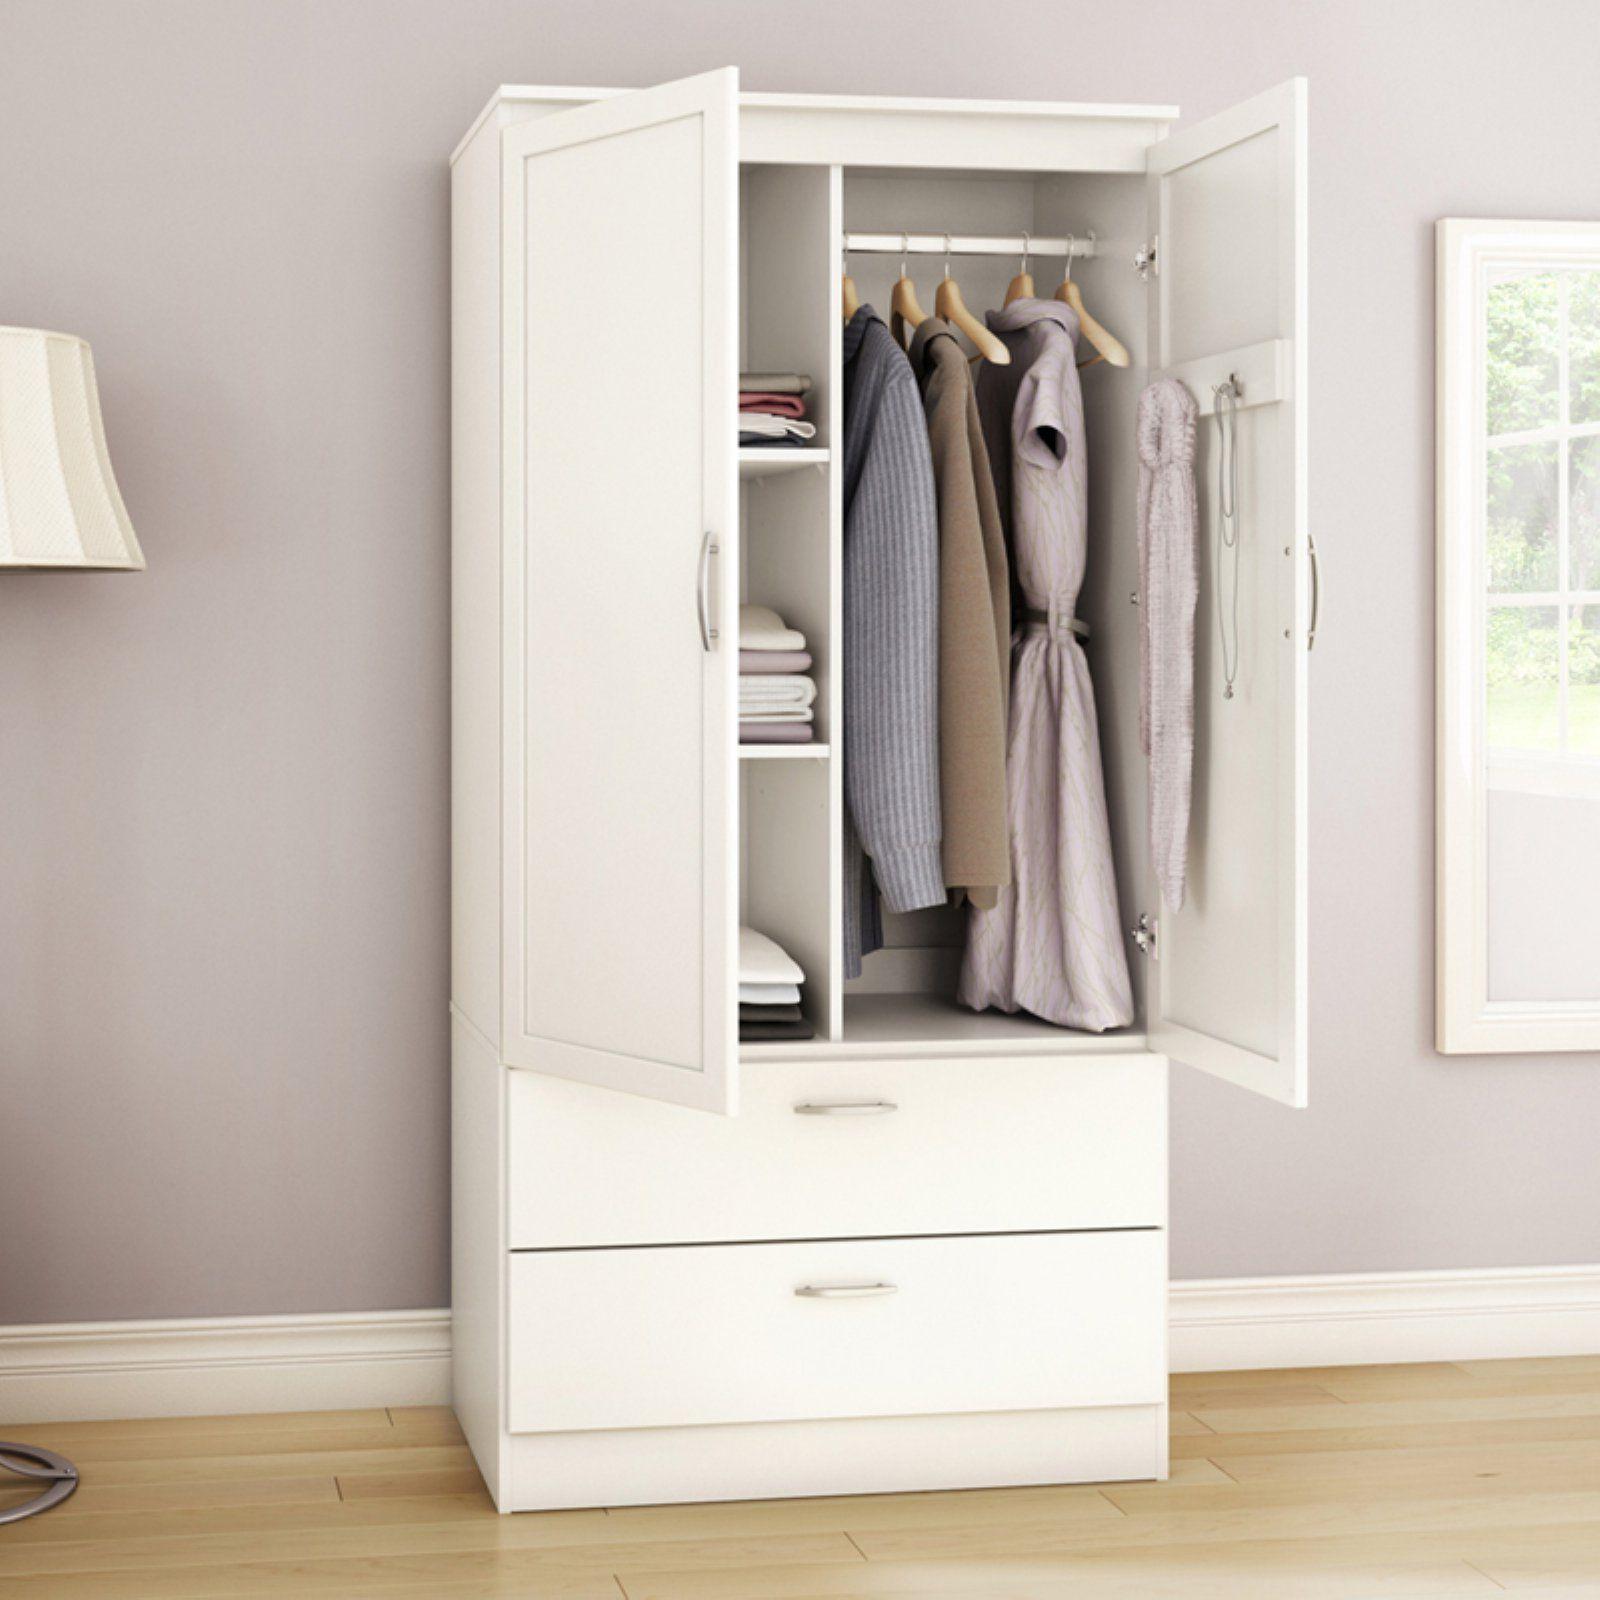 Acapella Wardrobe Armoire By South Shore In 2020 Armoire Storage Spaces Master Bedroom Closet